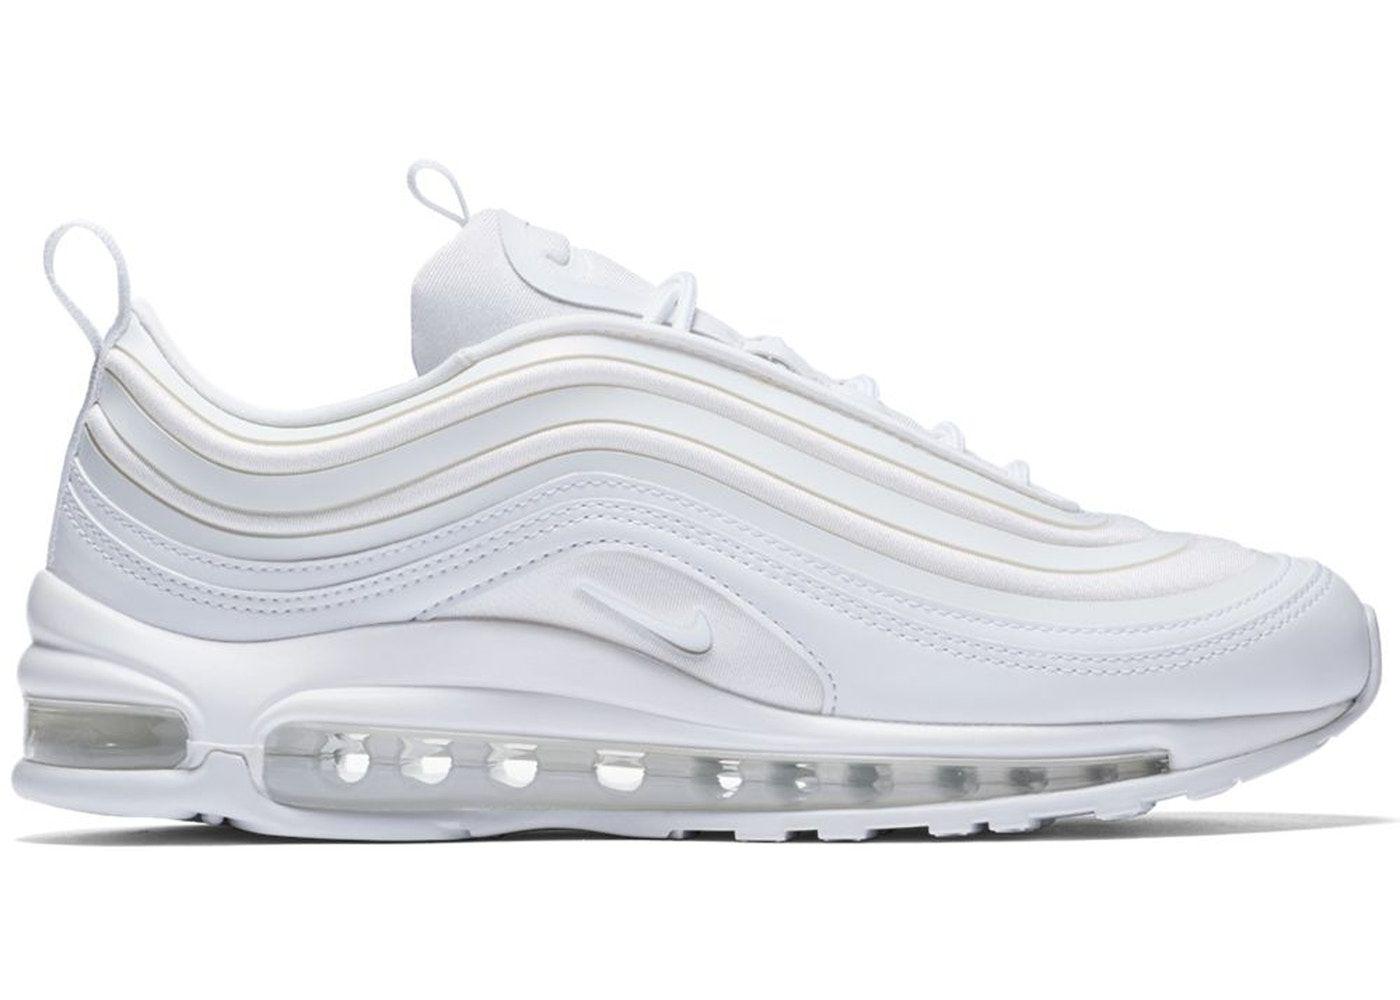 Controversia franja Típicamente  Nike Air Max 97 Ultra 17 Triple White (W) in 2021 | White nike tennis shoes,  Nike air max, Nike air max 97